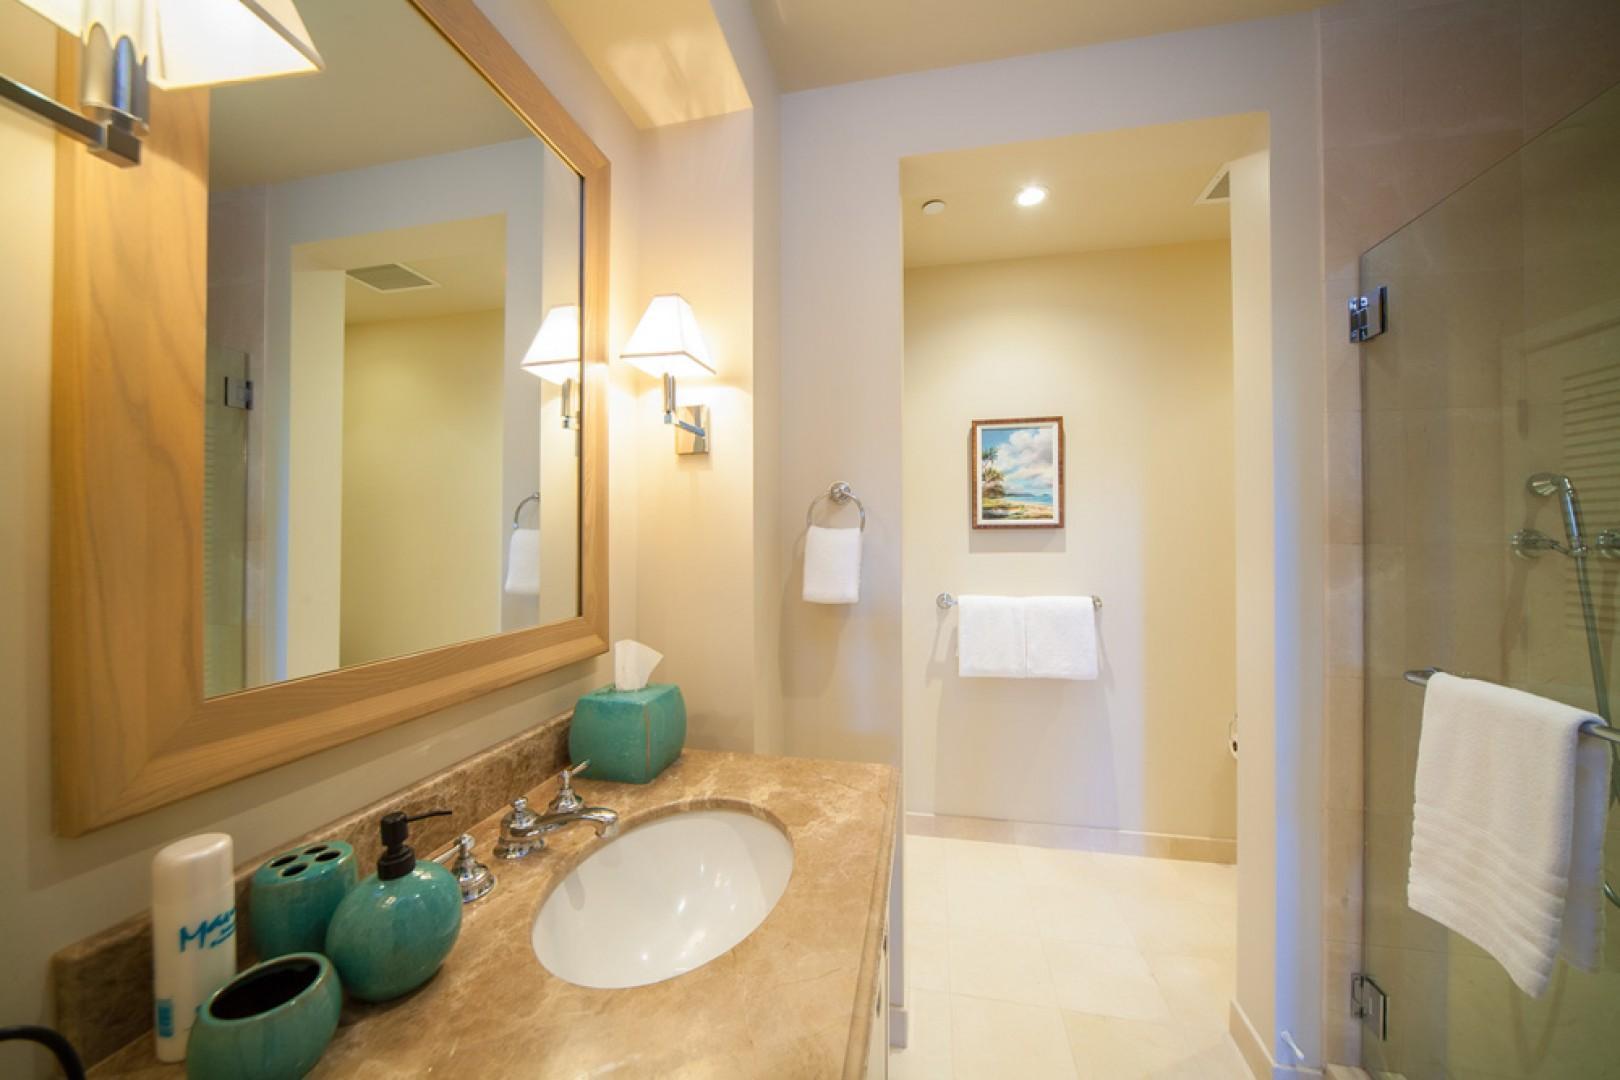 Blue Horizons K308 - Third Bedroom Bath with Glass Shower and Linen Closet